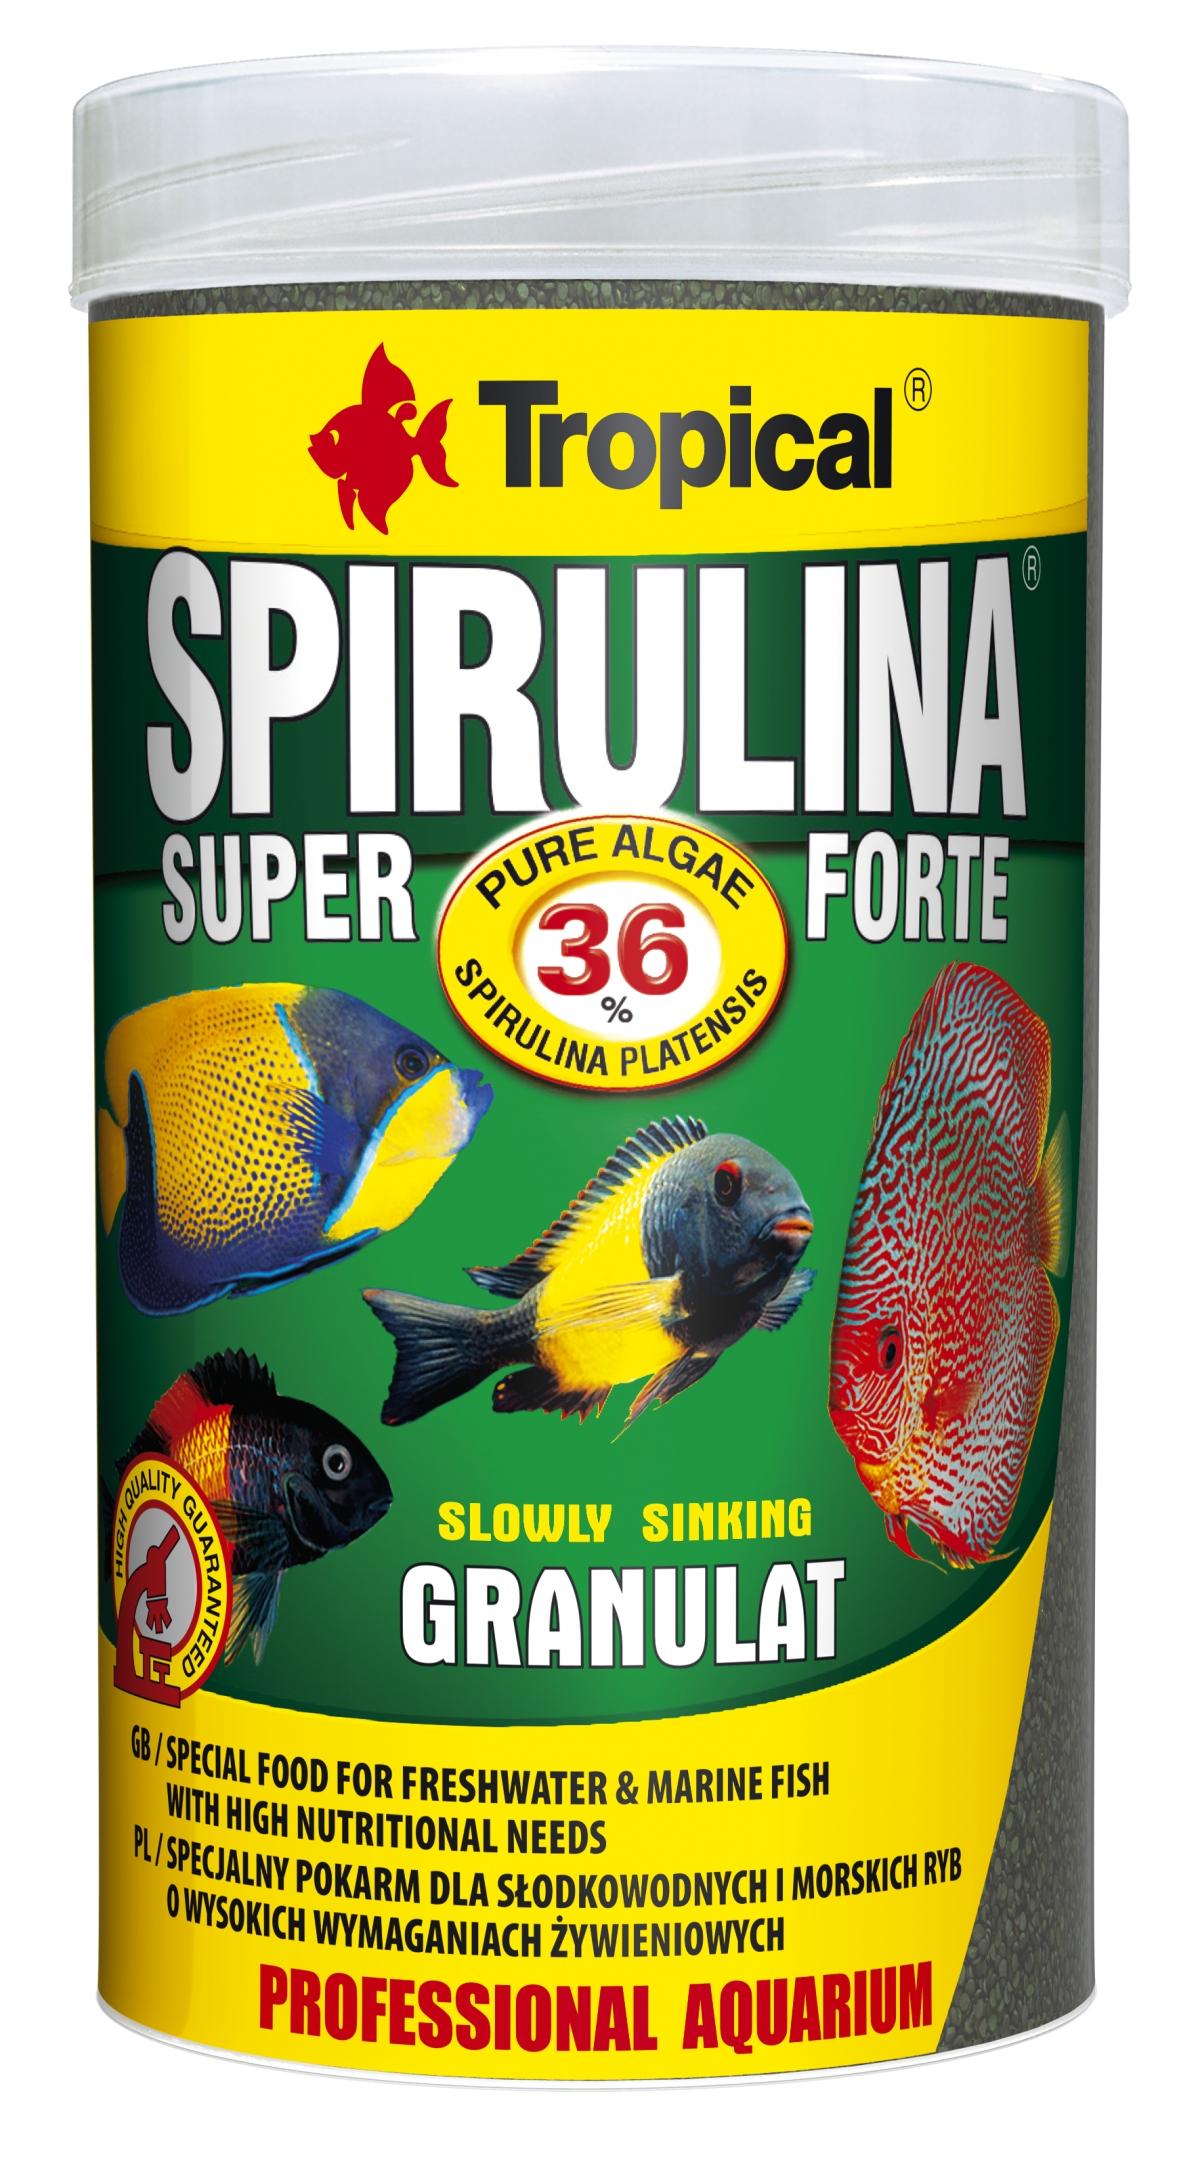 Tropical Super Spirulina Forte Granulát 36% - 1000ml /600g